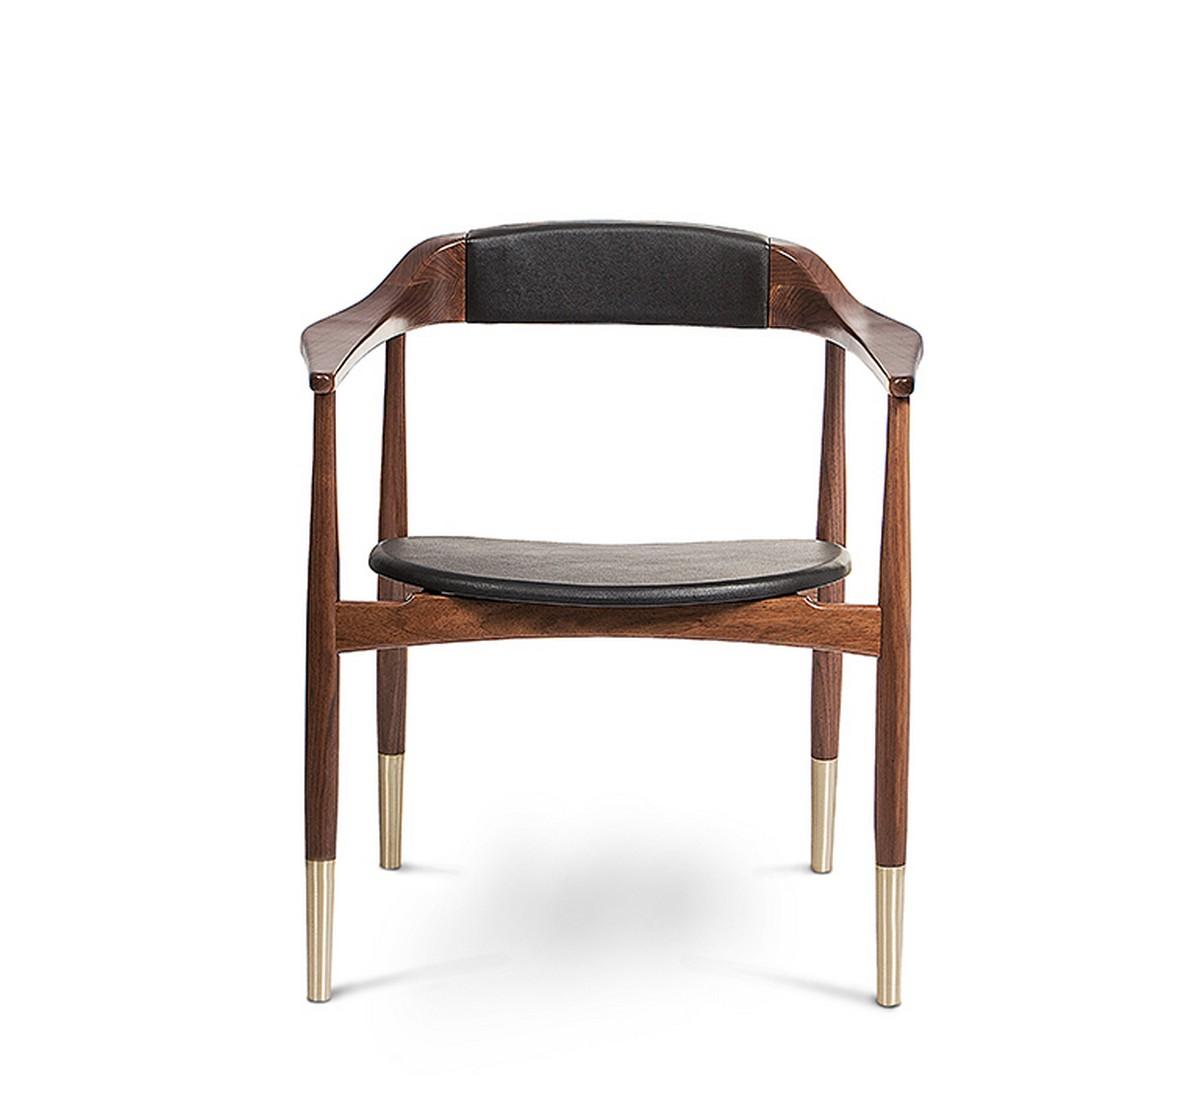 A Bit Classic, A Bit Modern: Perry Dining Chair By Essential Home dining chair A Bit Classic, A Bit Modern: Perry Dining Chair By Essential Home 1 10